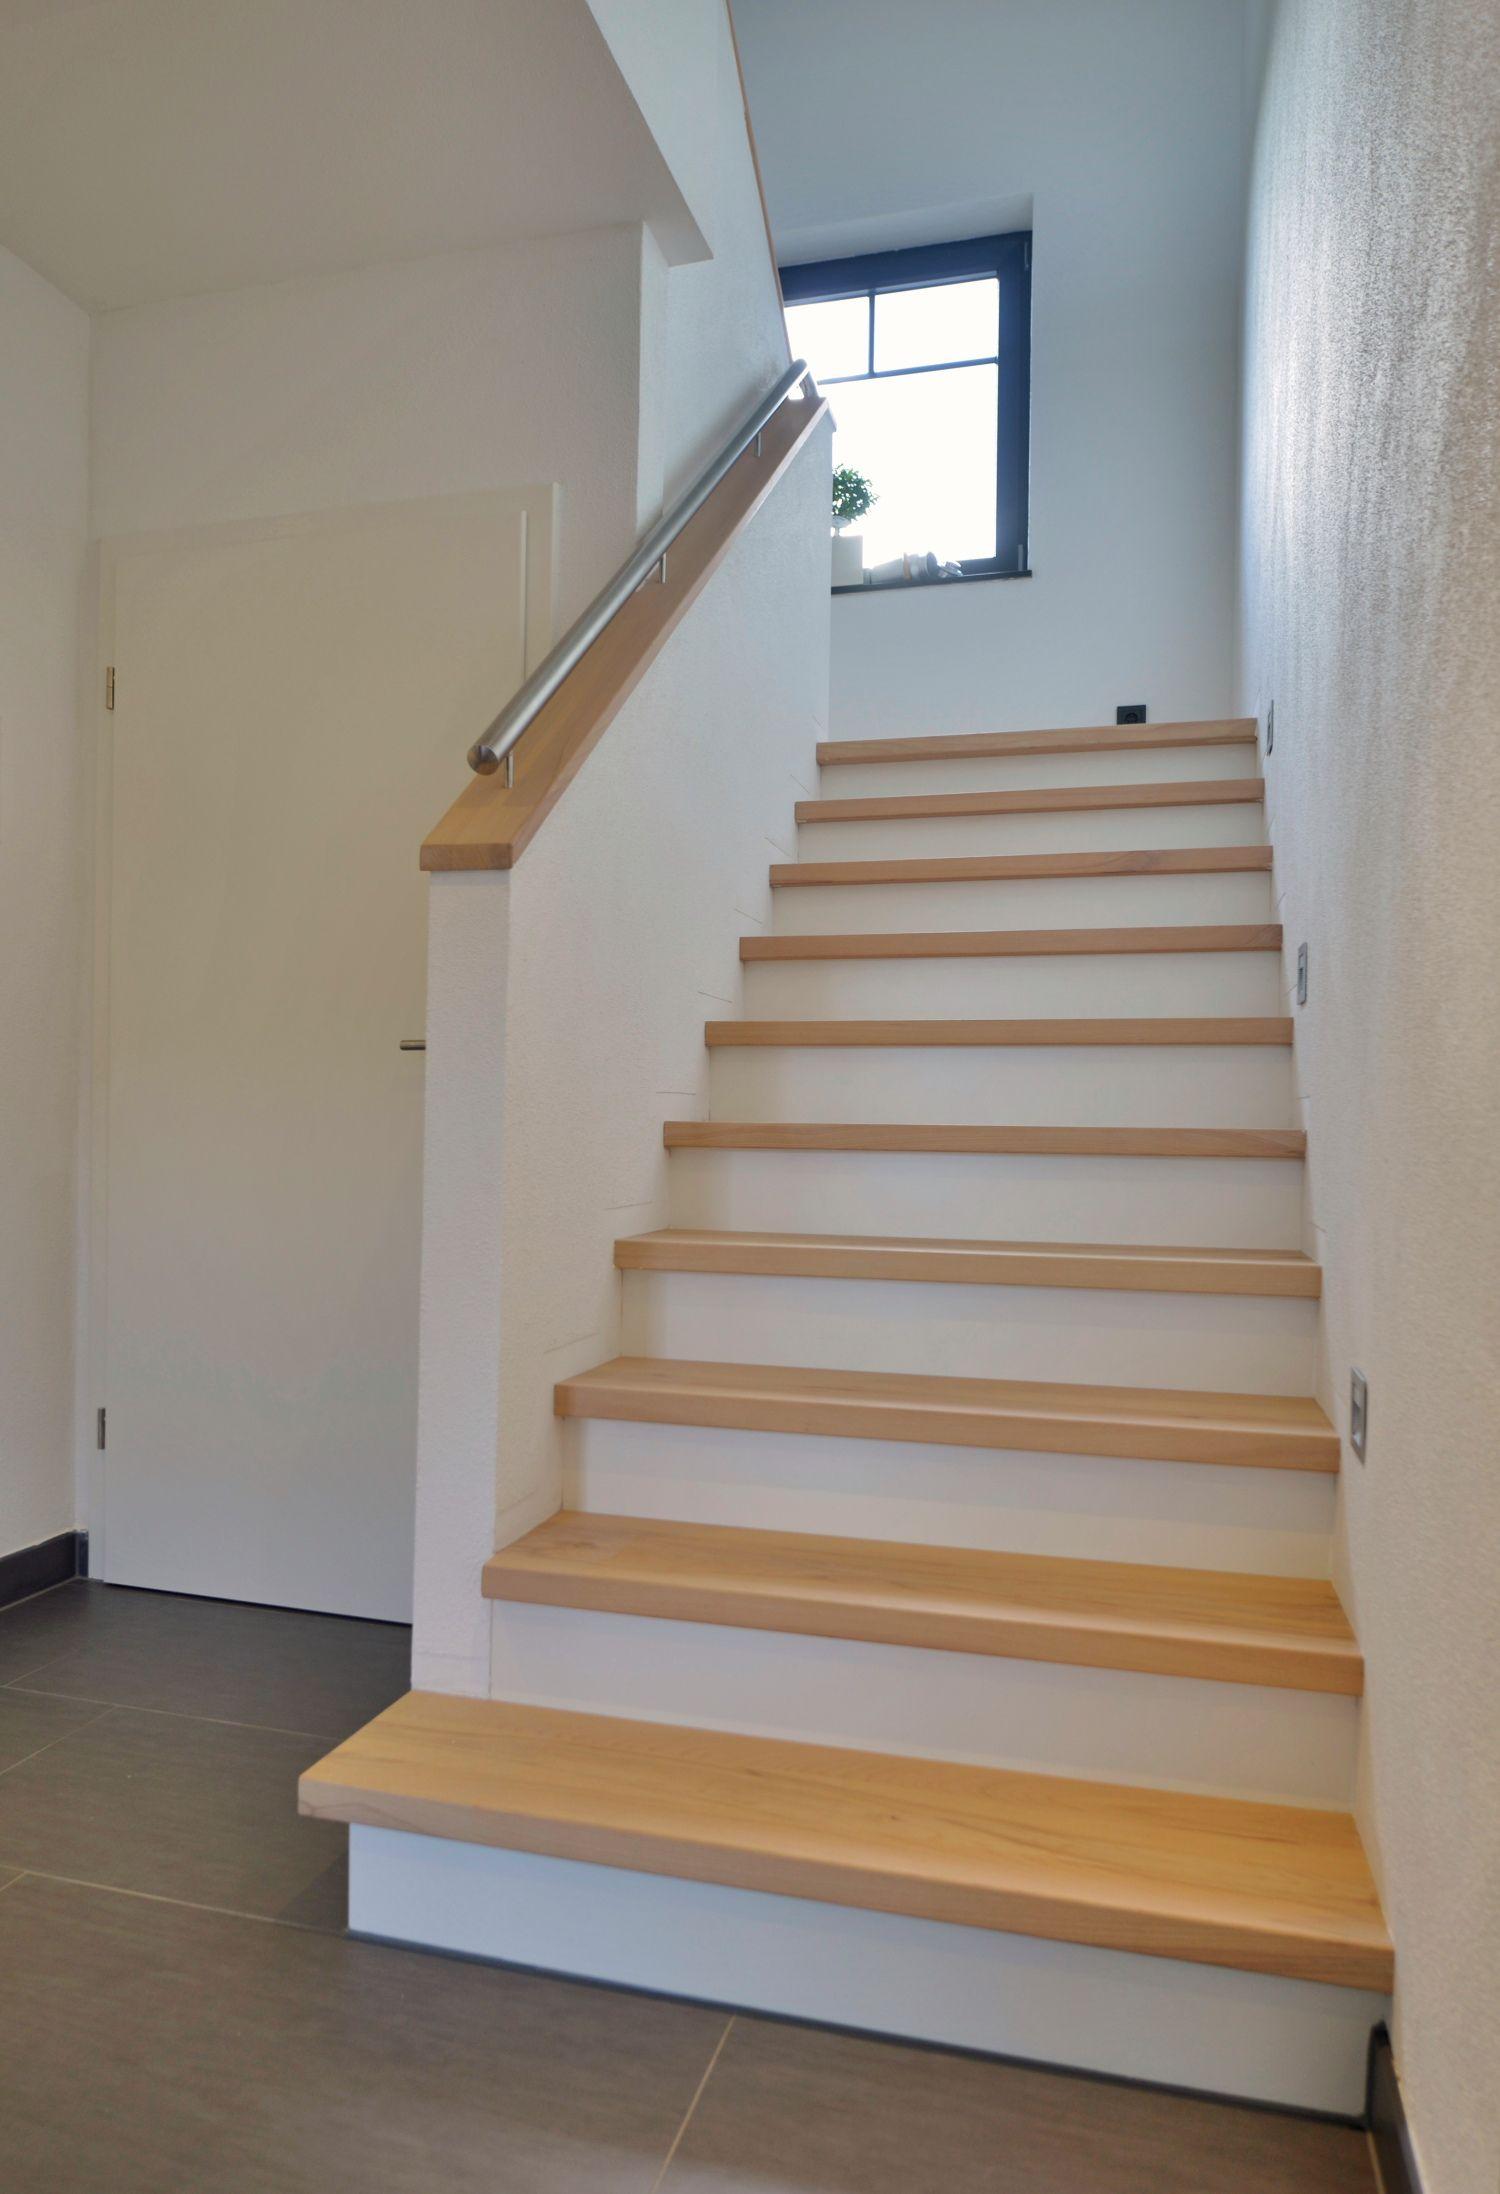 wangentreppen aufgesattelt treppenbau becker flur in 2019 treppe treppe haus und treppenhaus. Black Bedroom Furniture Sets. Home Design Ideas